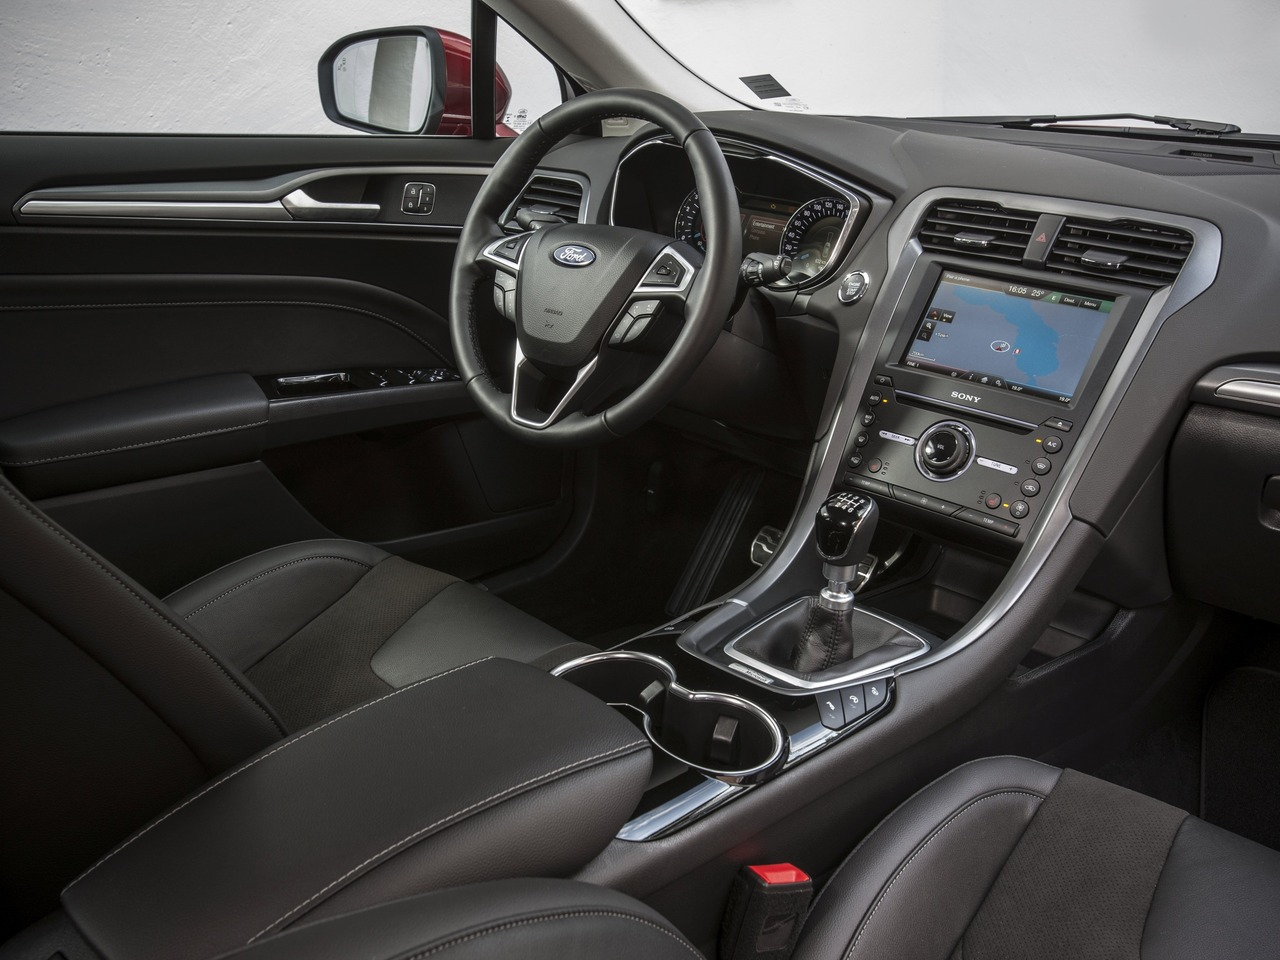 Снимки: Ford Mondeo V